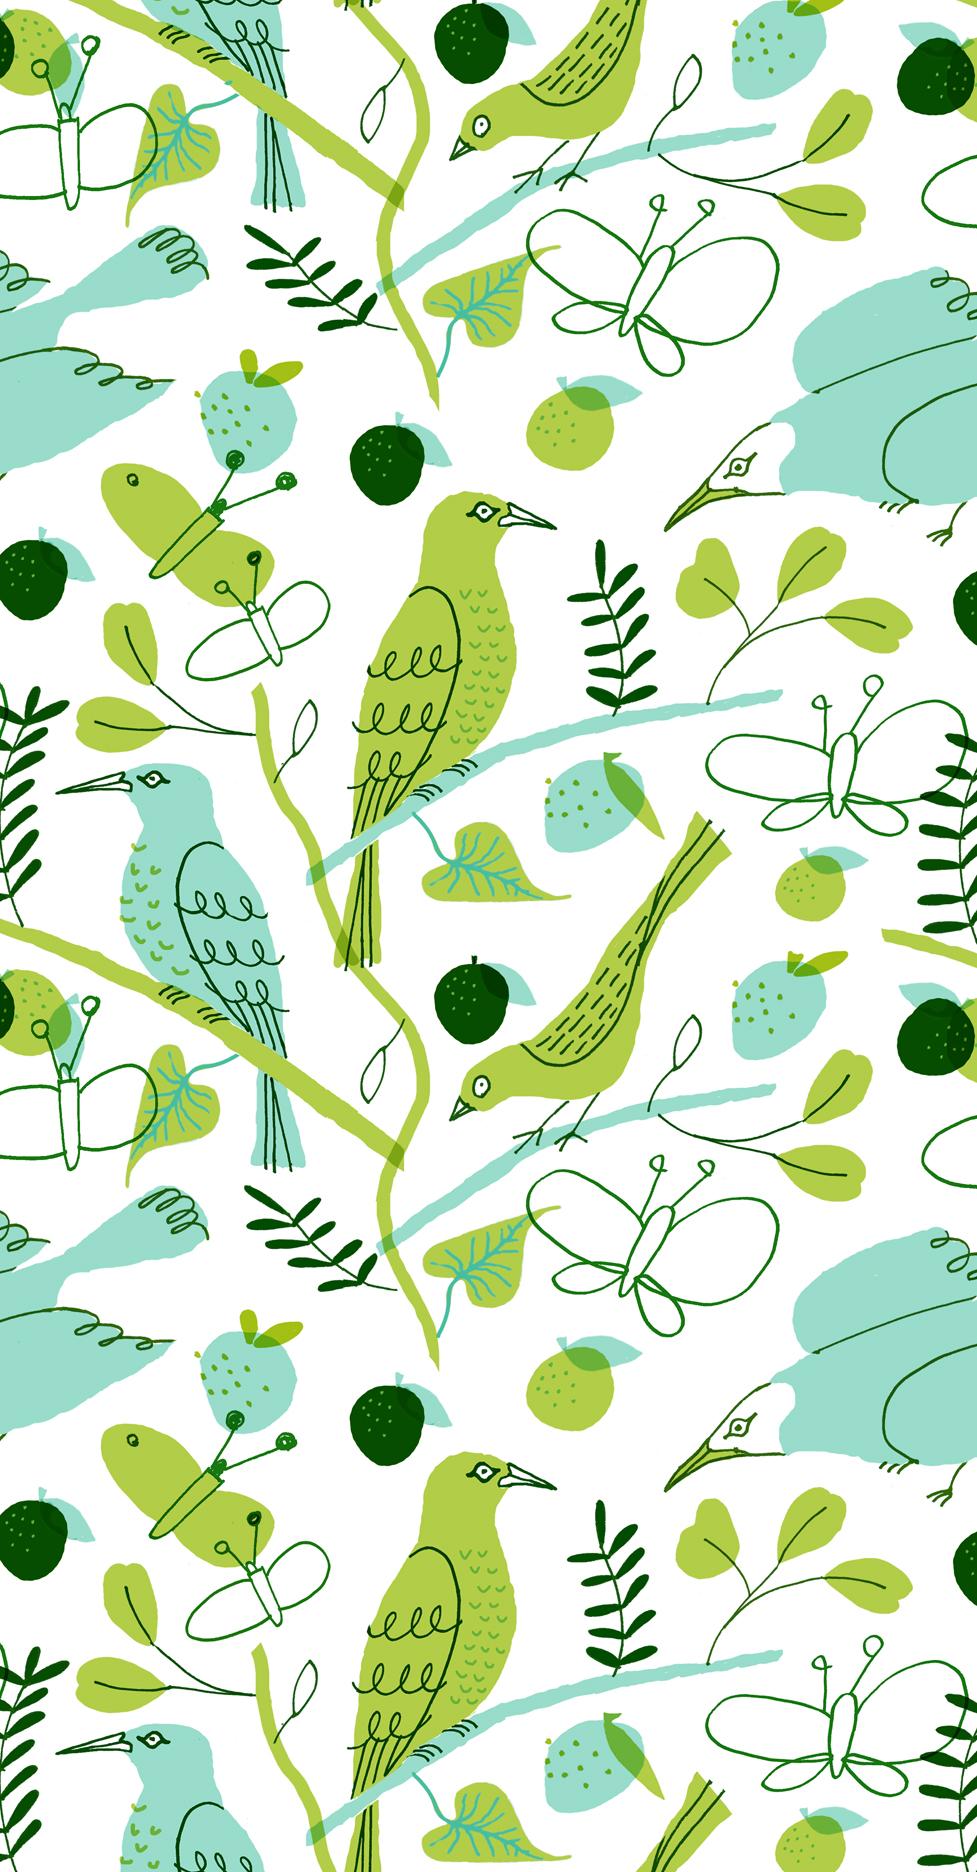 pinterest birds.jpg